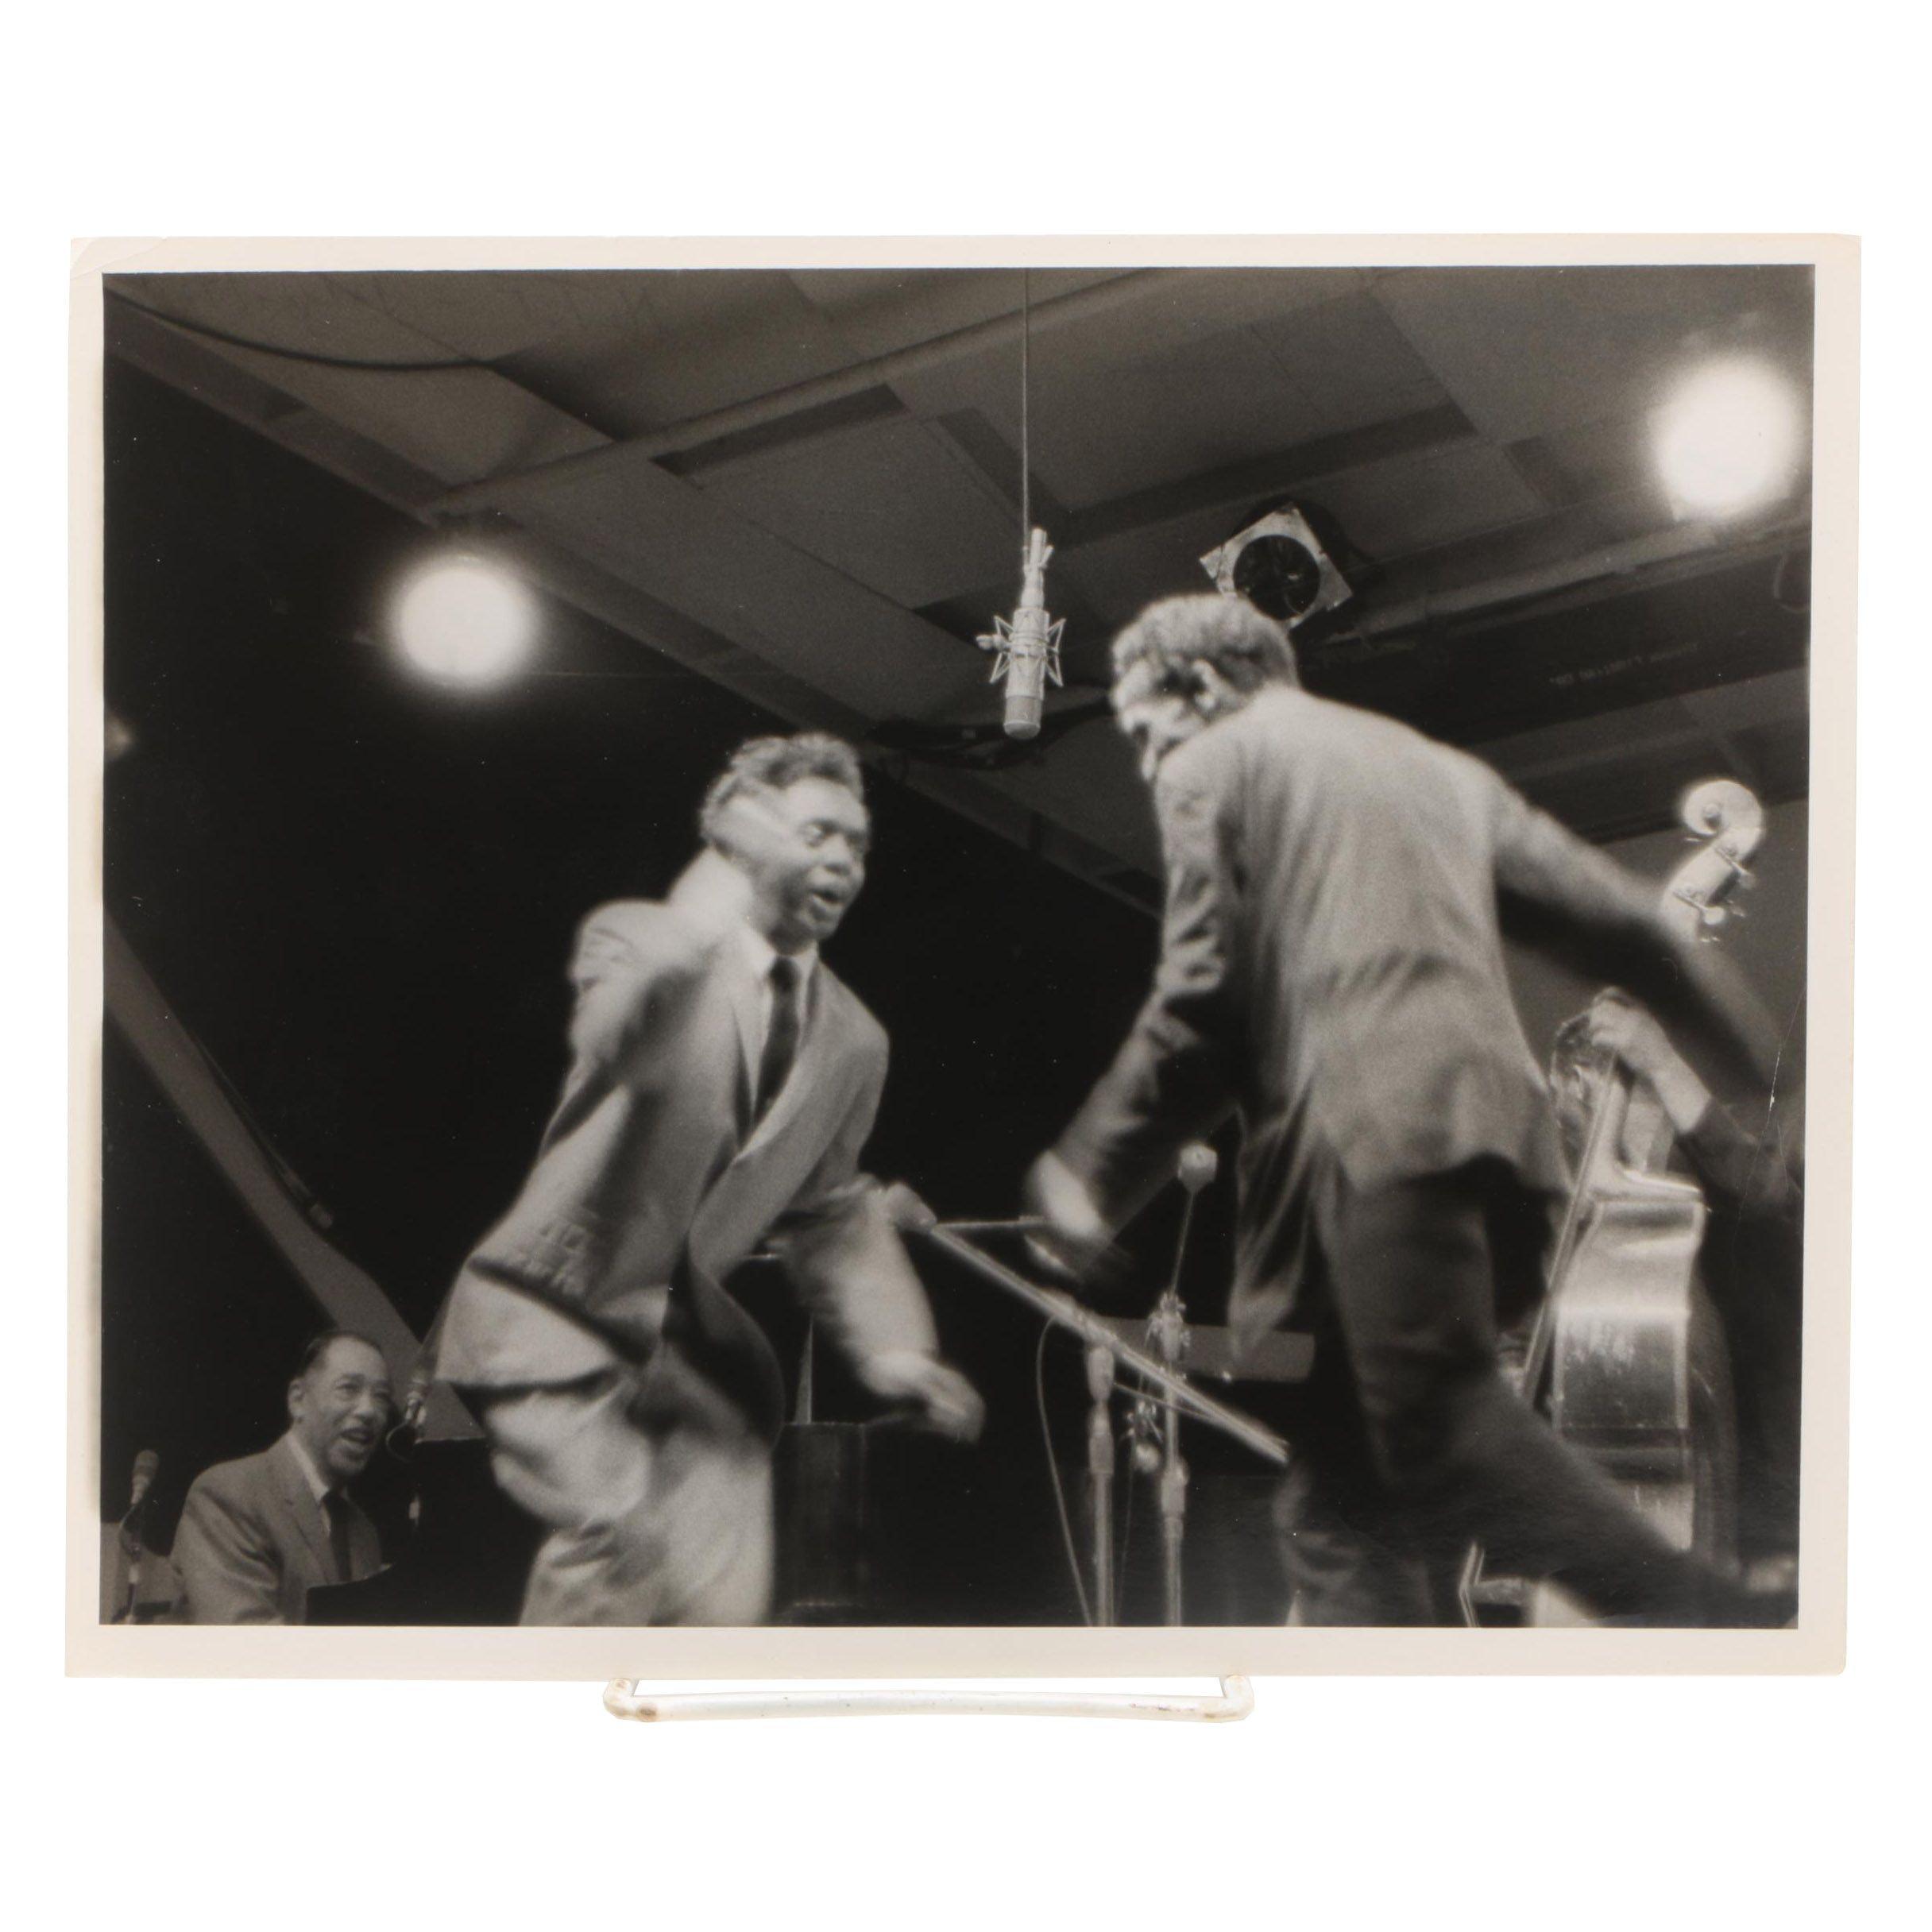 1963 Silver-Gelatin Photograph of Duke Ellington from Jack Bradley Collection